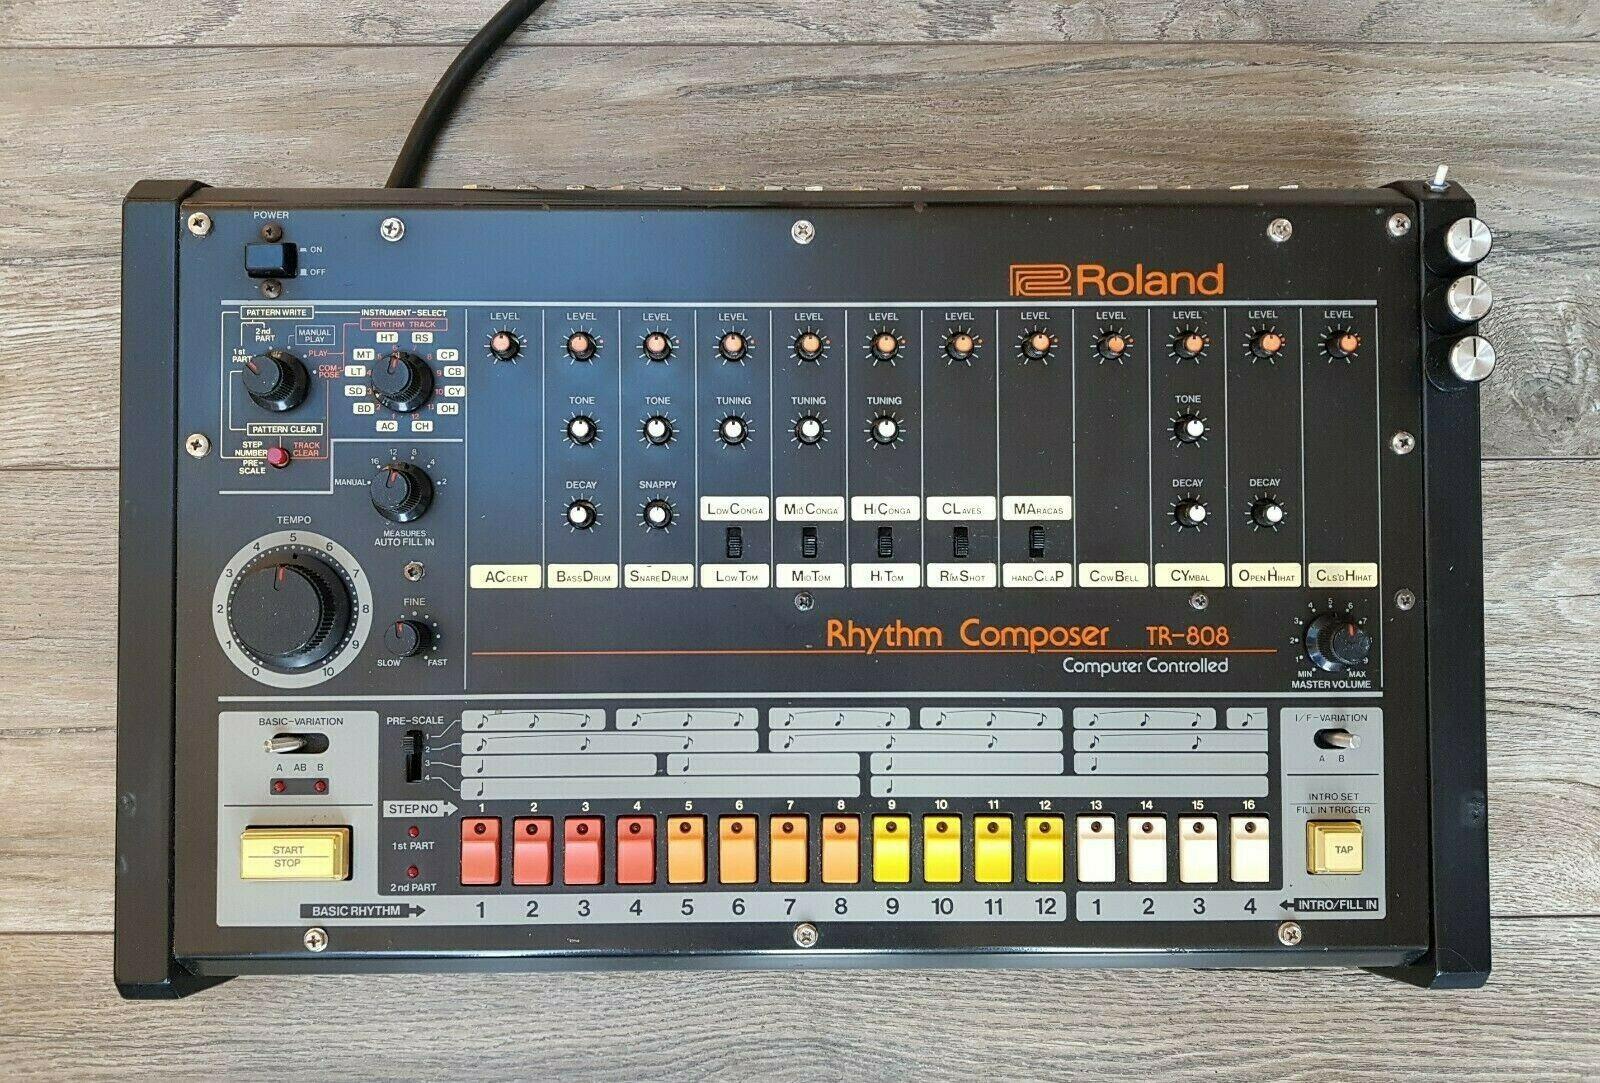 Драм-машина Roland TR-808 включена в технологический Зал славы NAMM TECnology Hall Of Fame